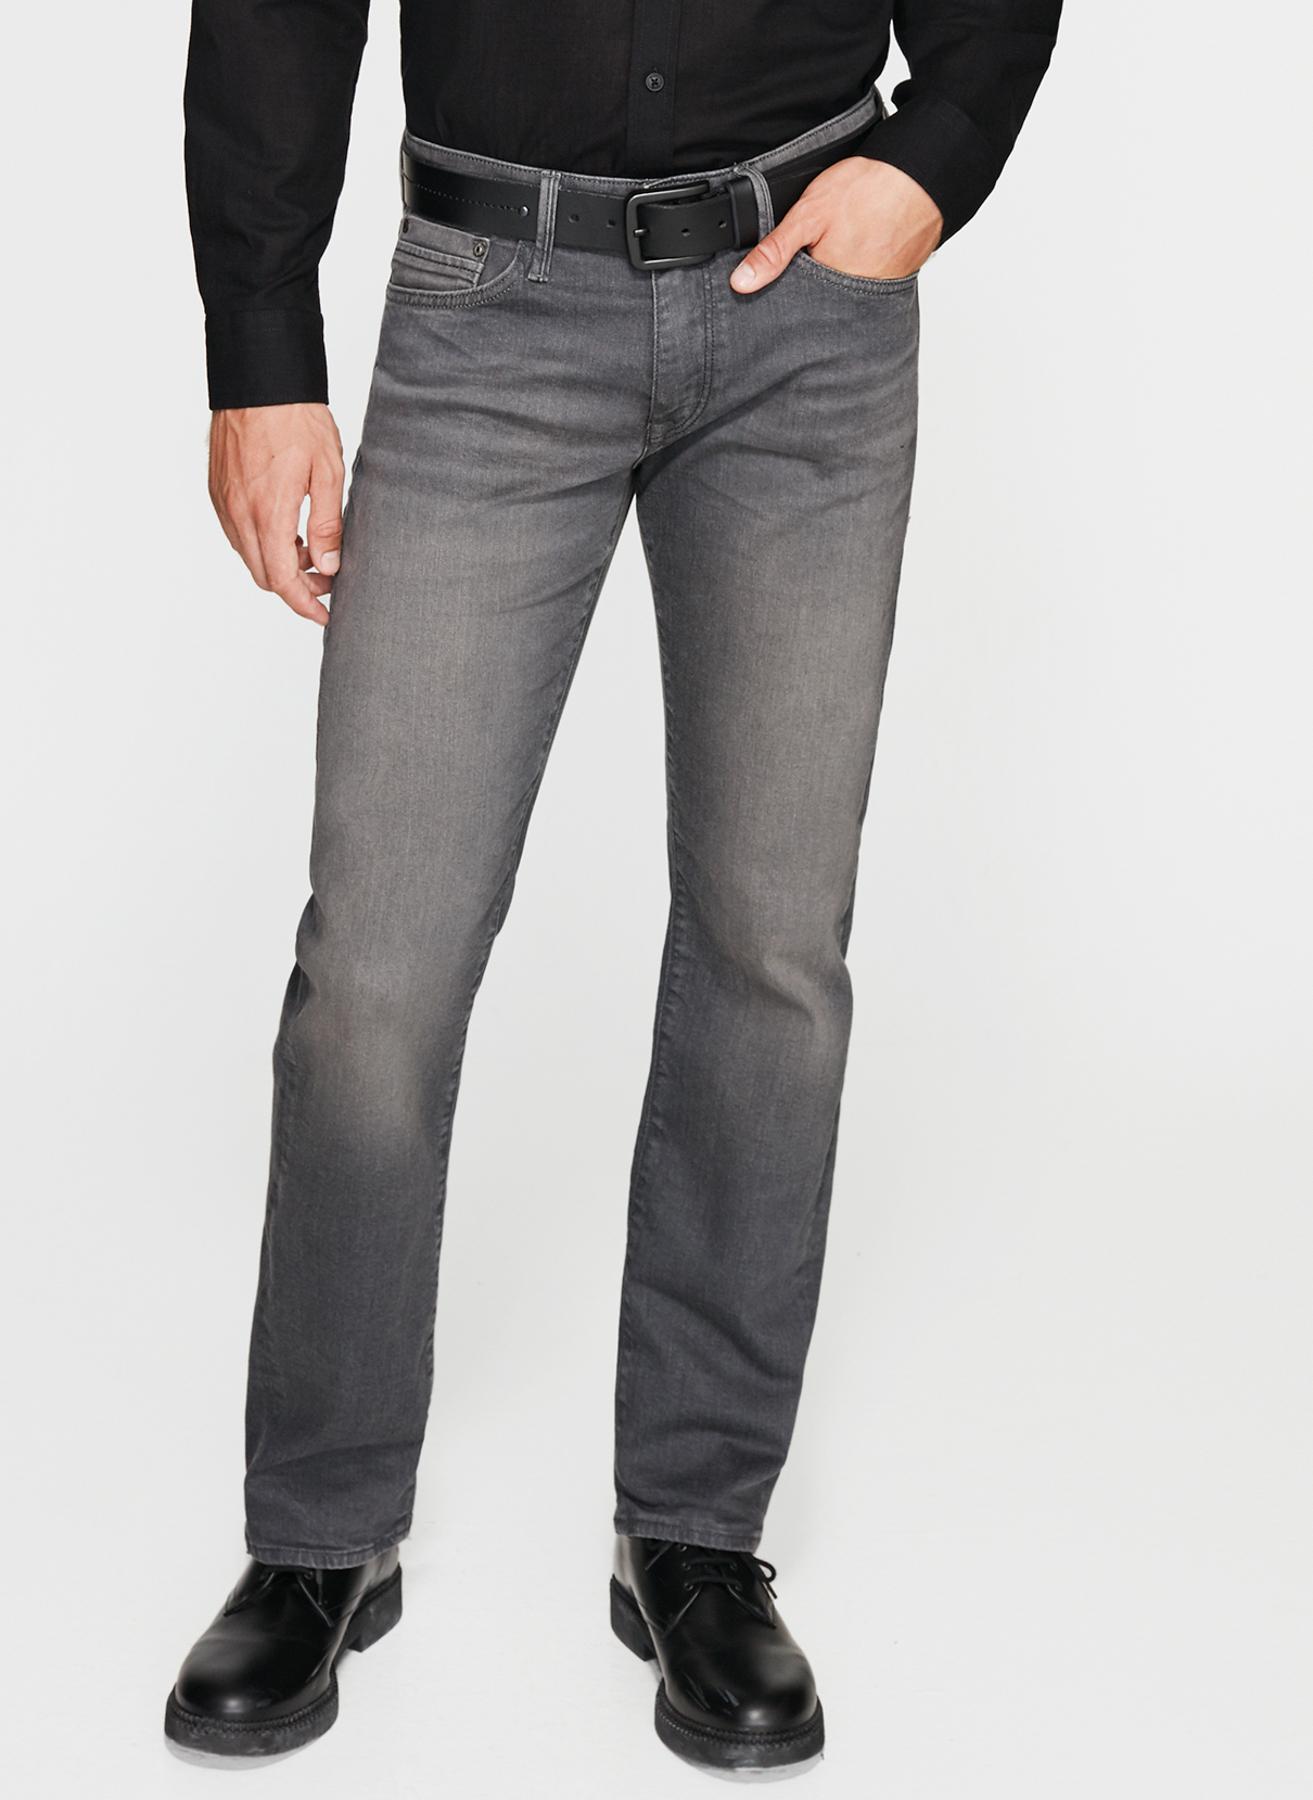 Mavi Klasik Pantolon 31-32 5001634309006 Ürün Resmi